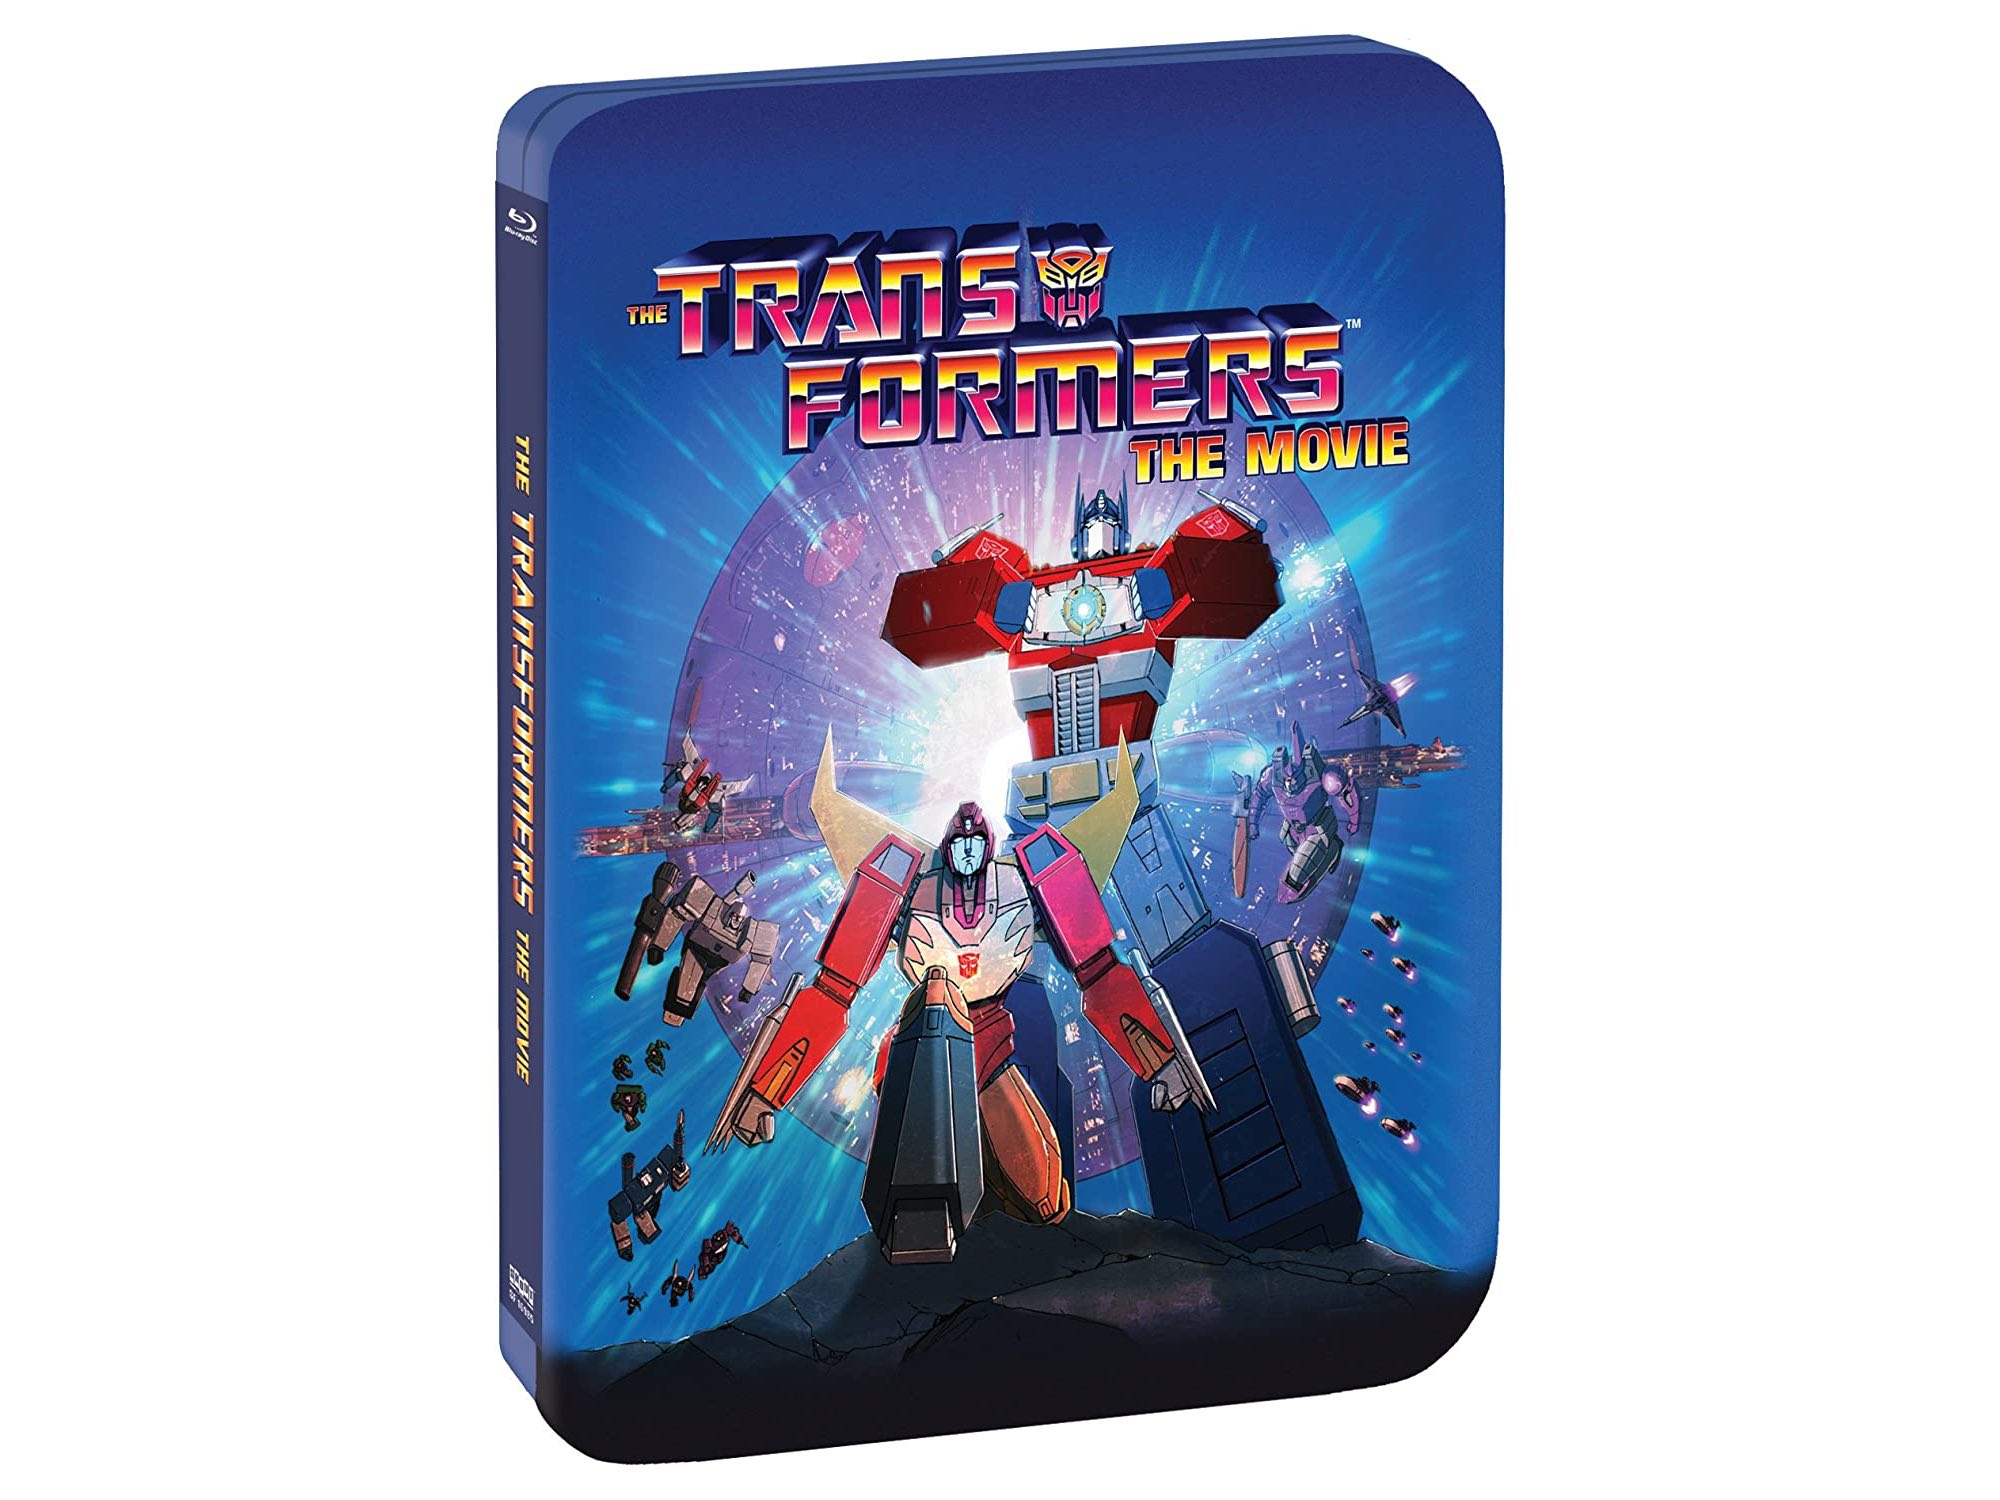 Transformers: The Movie (Limited Edition 30th Anniversary Steelbook) [Blu-ray/Digital]